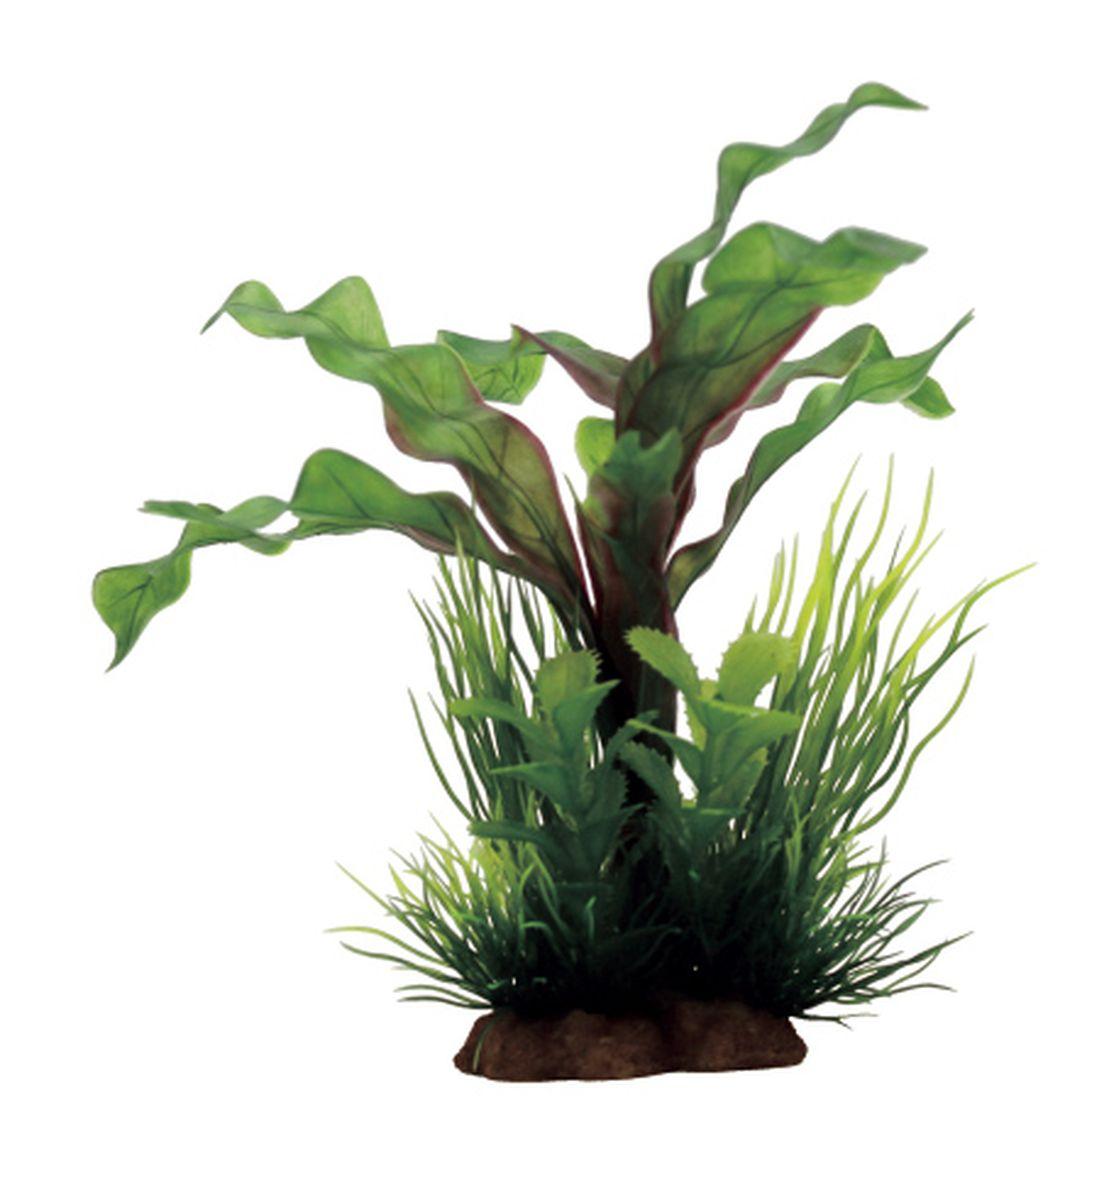 Композиция из растений для аквариума ArtUniq Апоногетон, 12 x 10 x 20 см0120710Композиция из растений для аквариума ArtUniq Апоногетон, 12 x 10 x 20 см